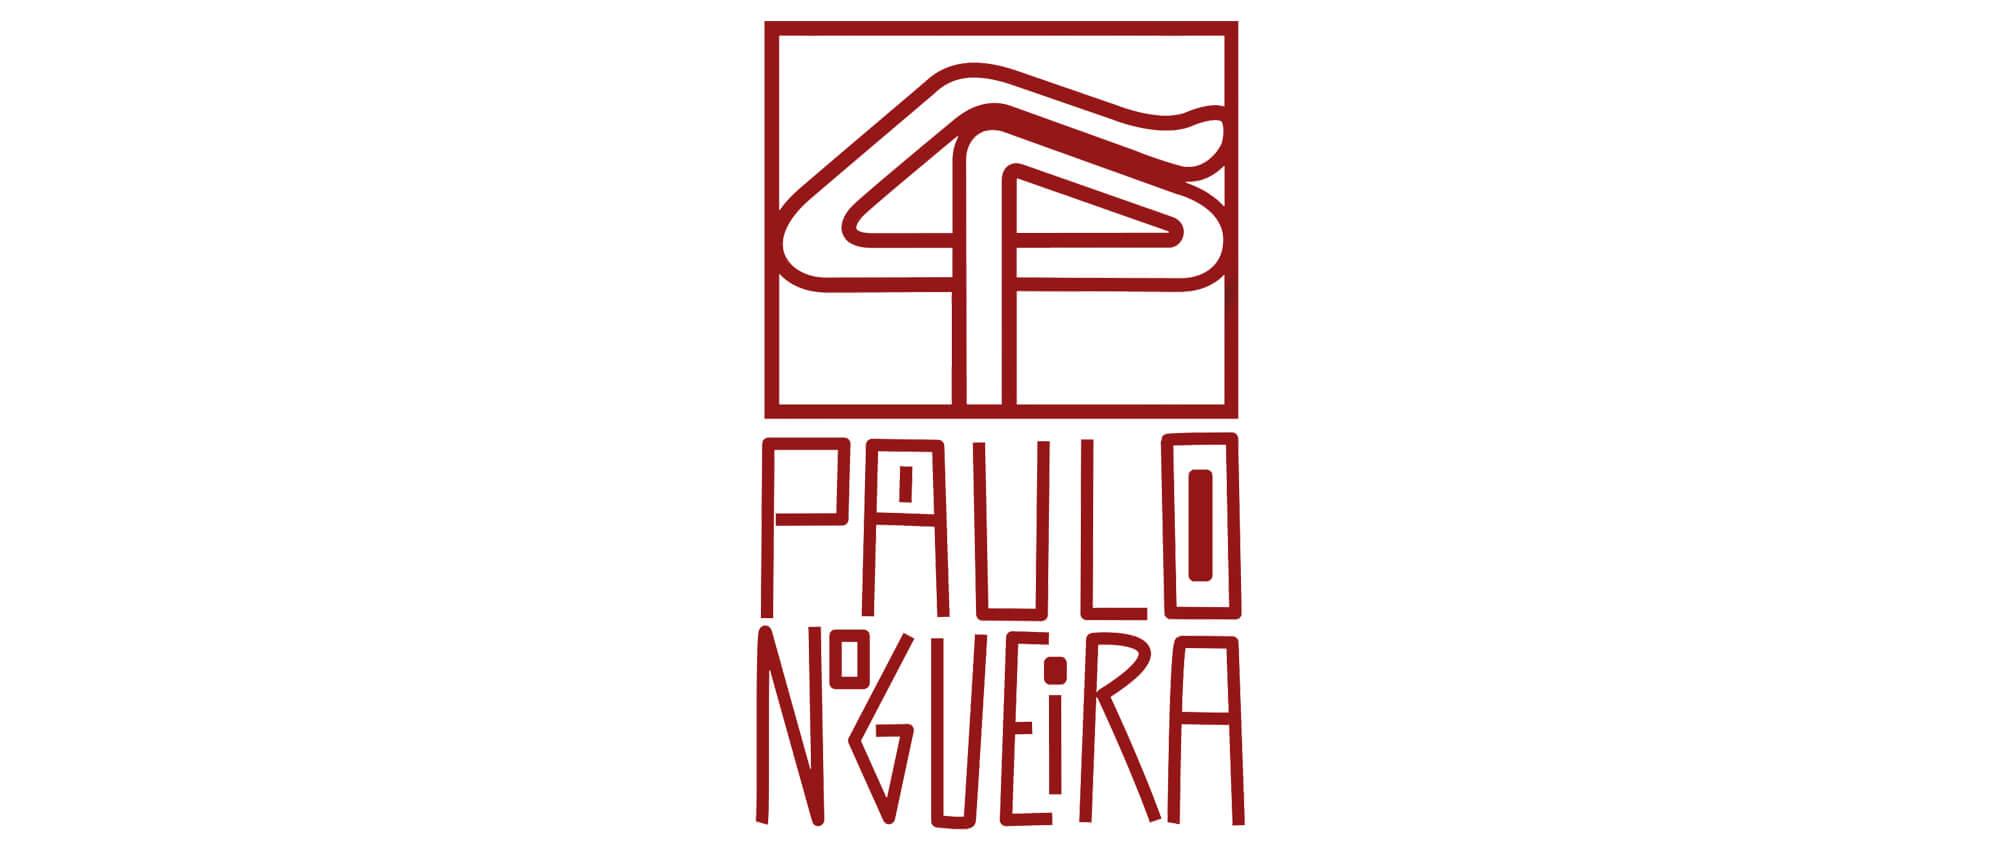 Atelier Paulo Nogueira